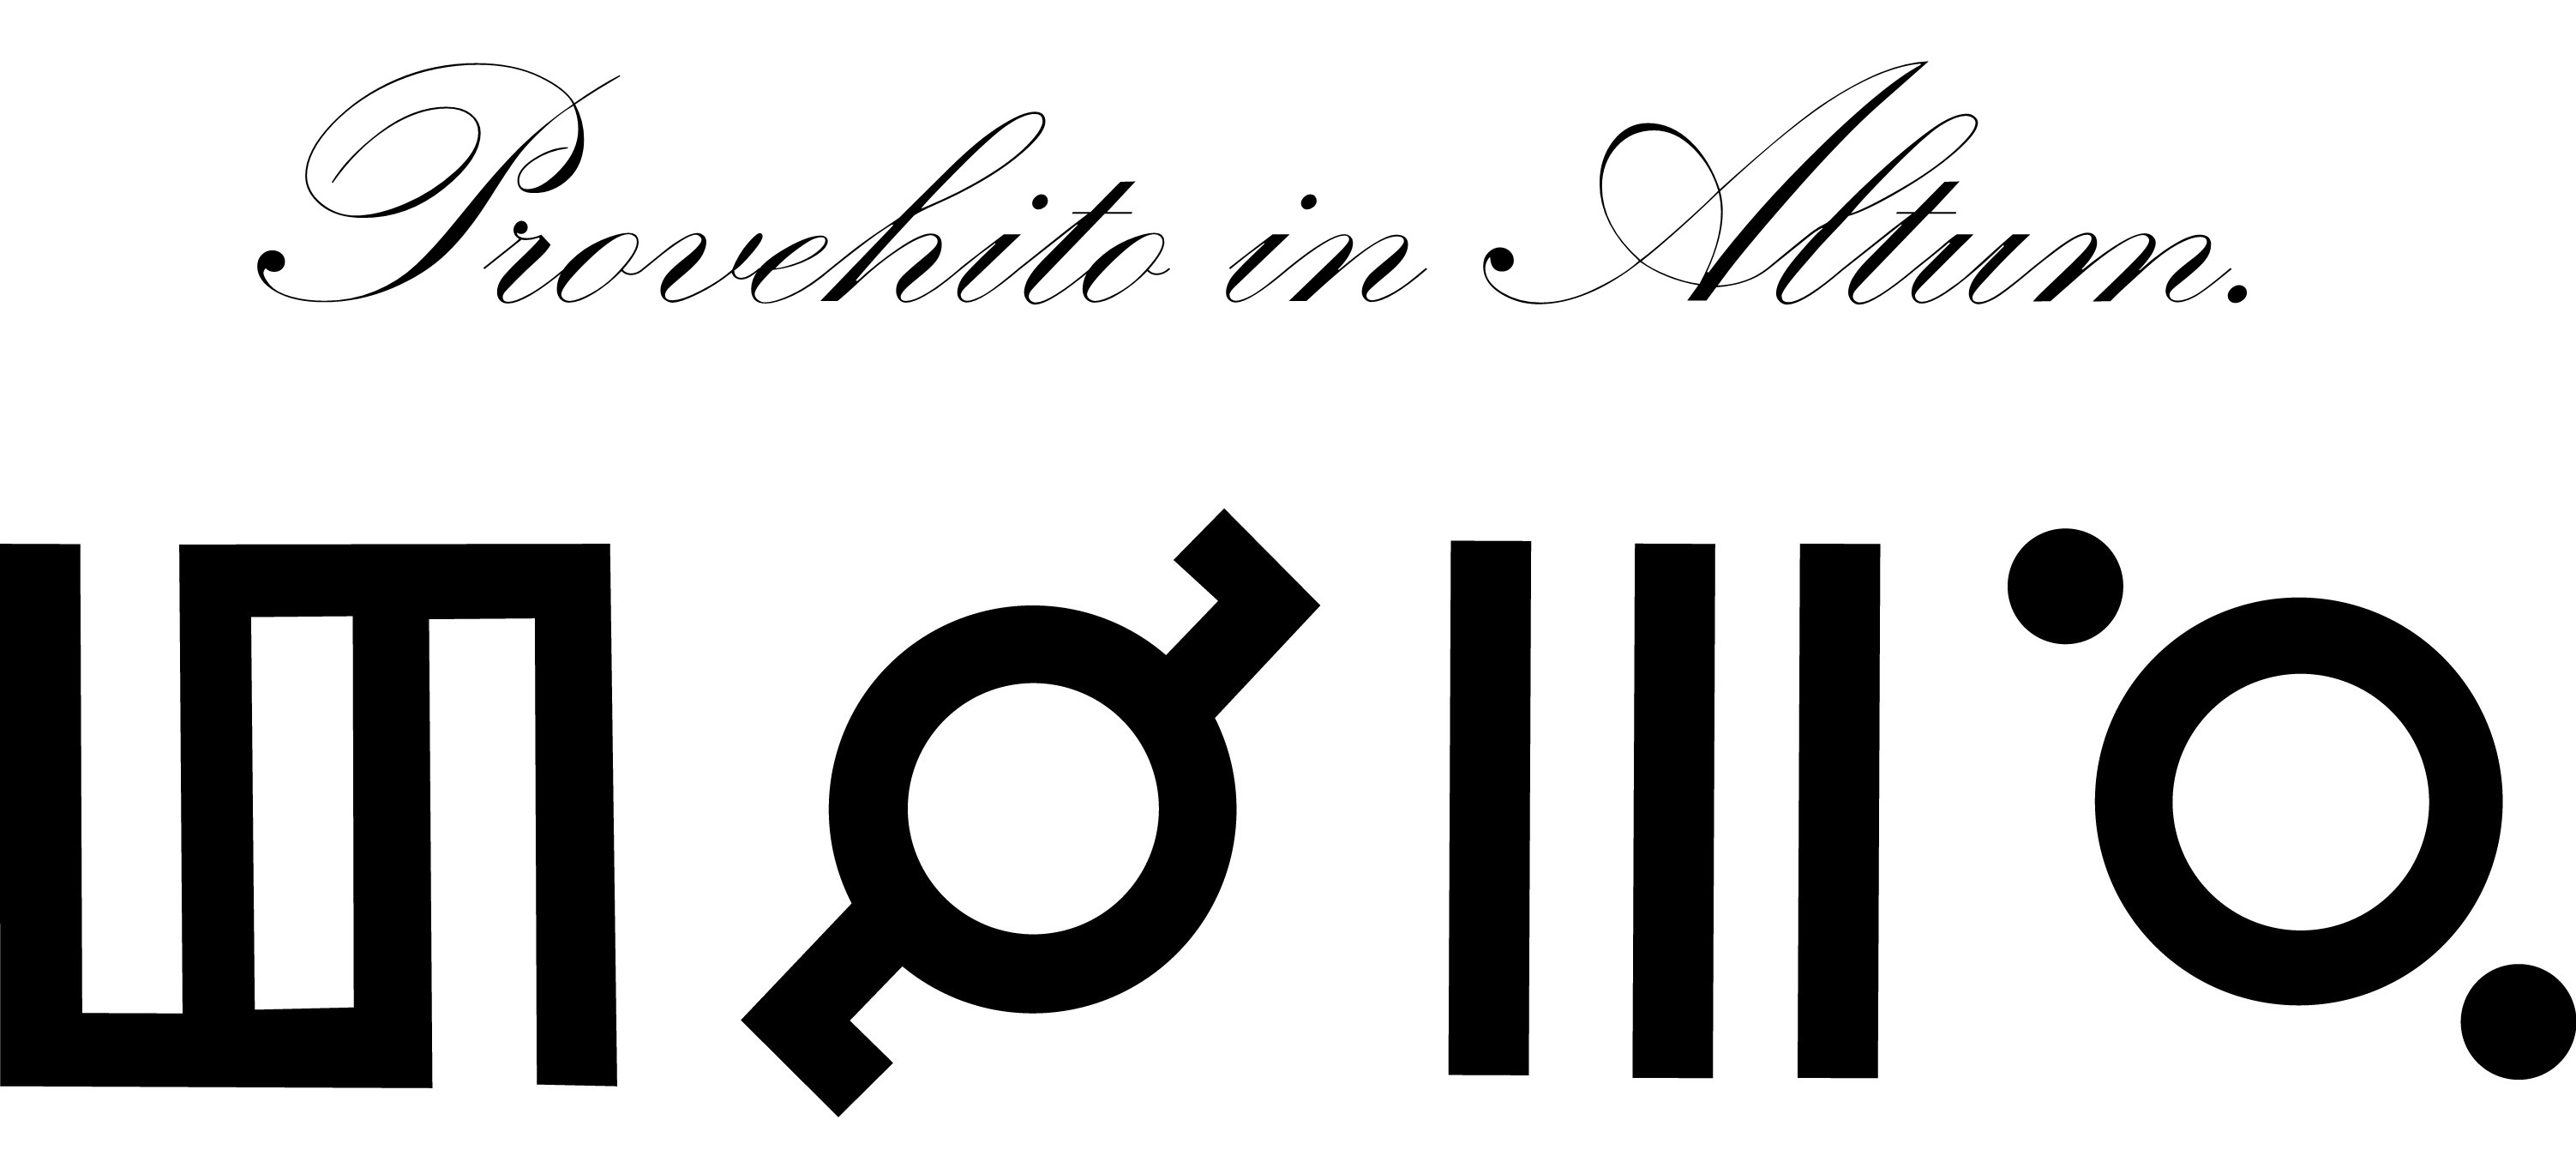 united states outline image B